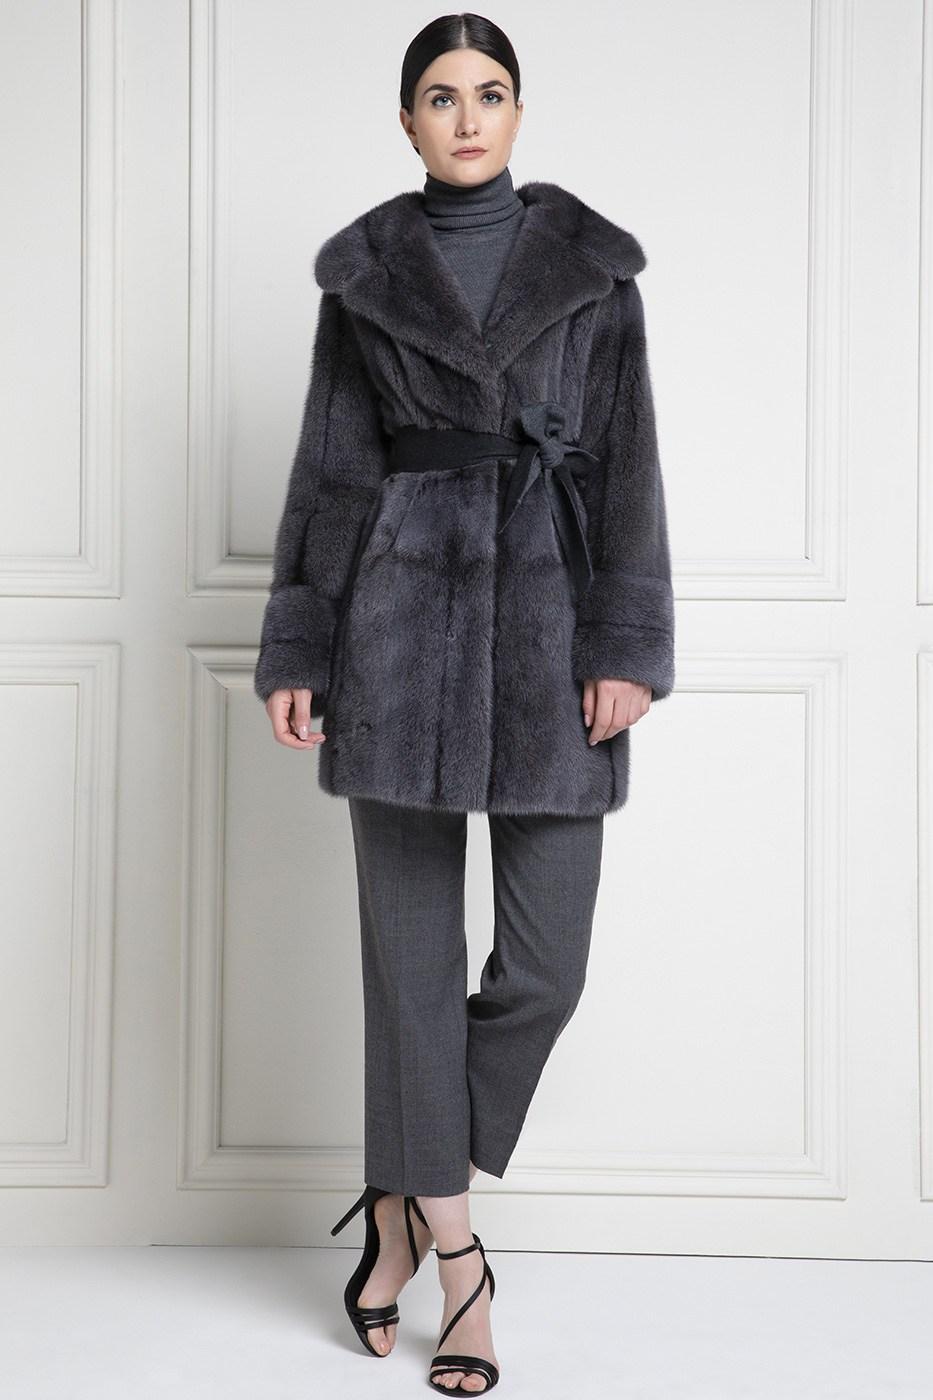 agreatvarietyofmodels online here modern style Mink Fur - Mink Fur Price - Mink Made in Italy - Elpidio ...